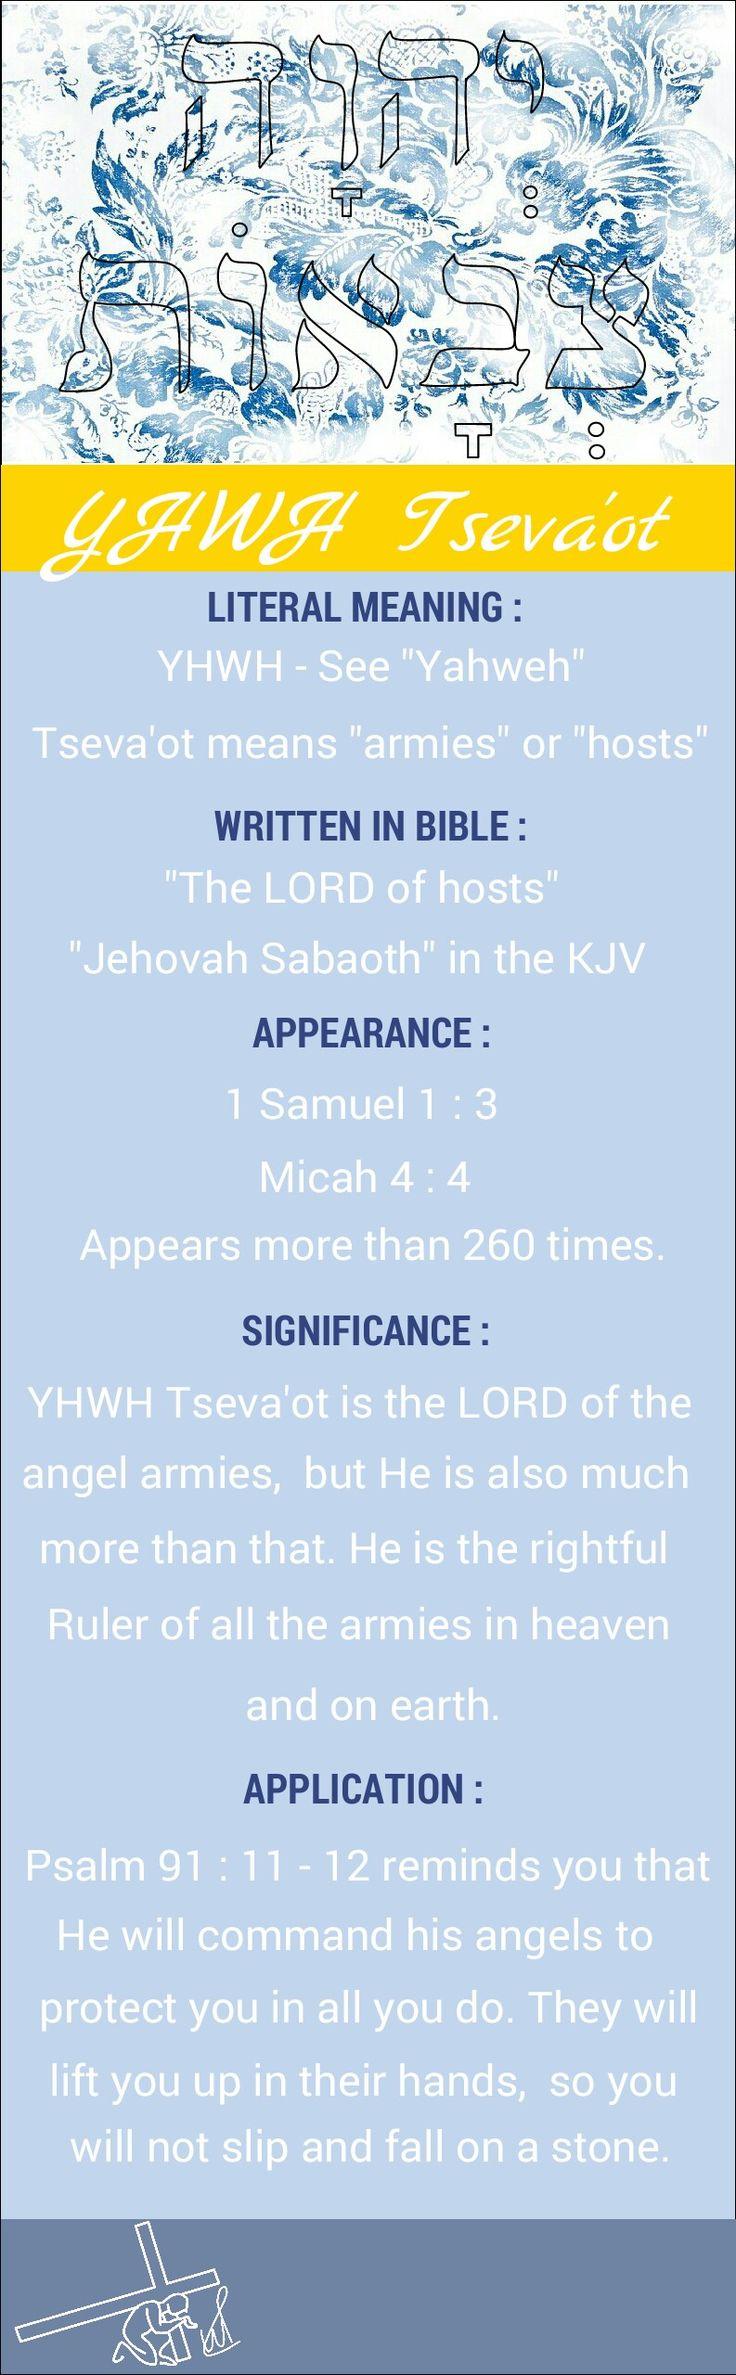 Names of God YHWH Tseva'ot Yahweh Tseva'ot Jehovah Sabaoth The LORD of hosts